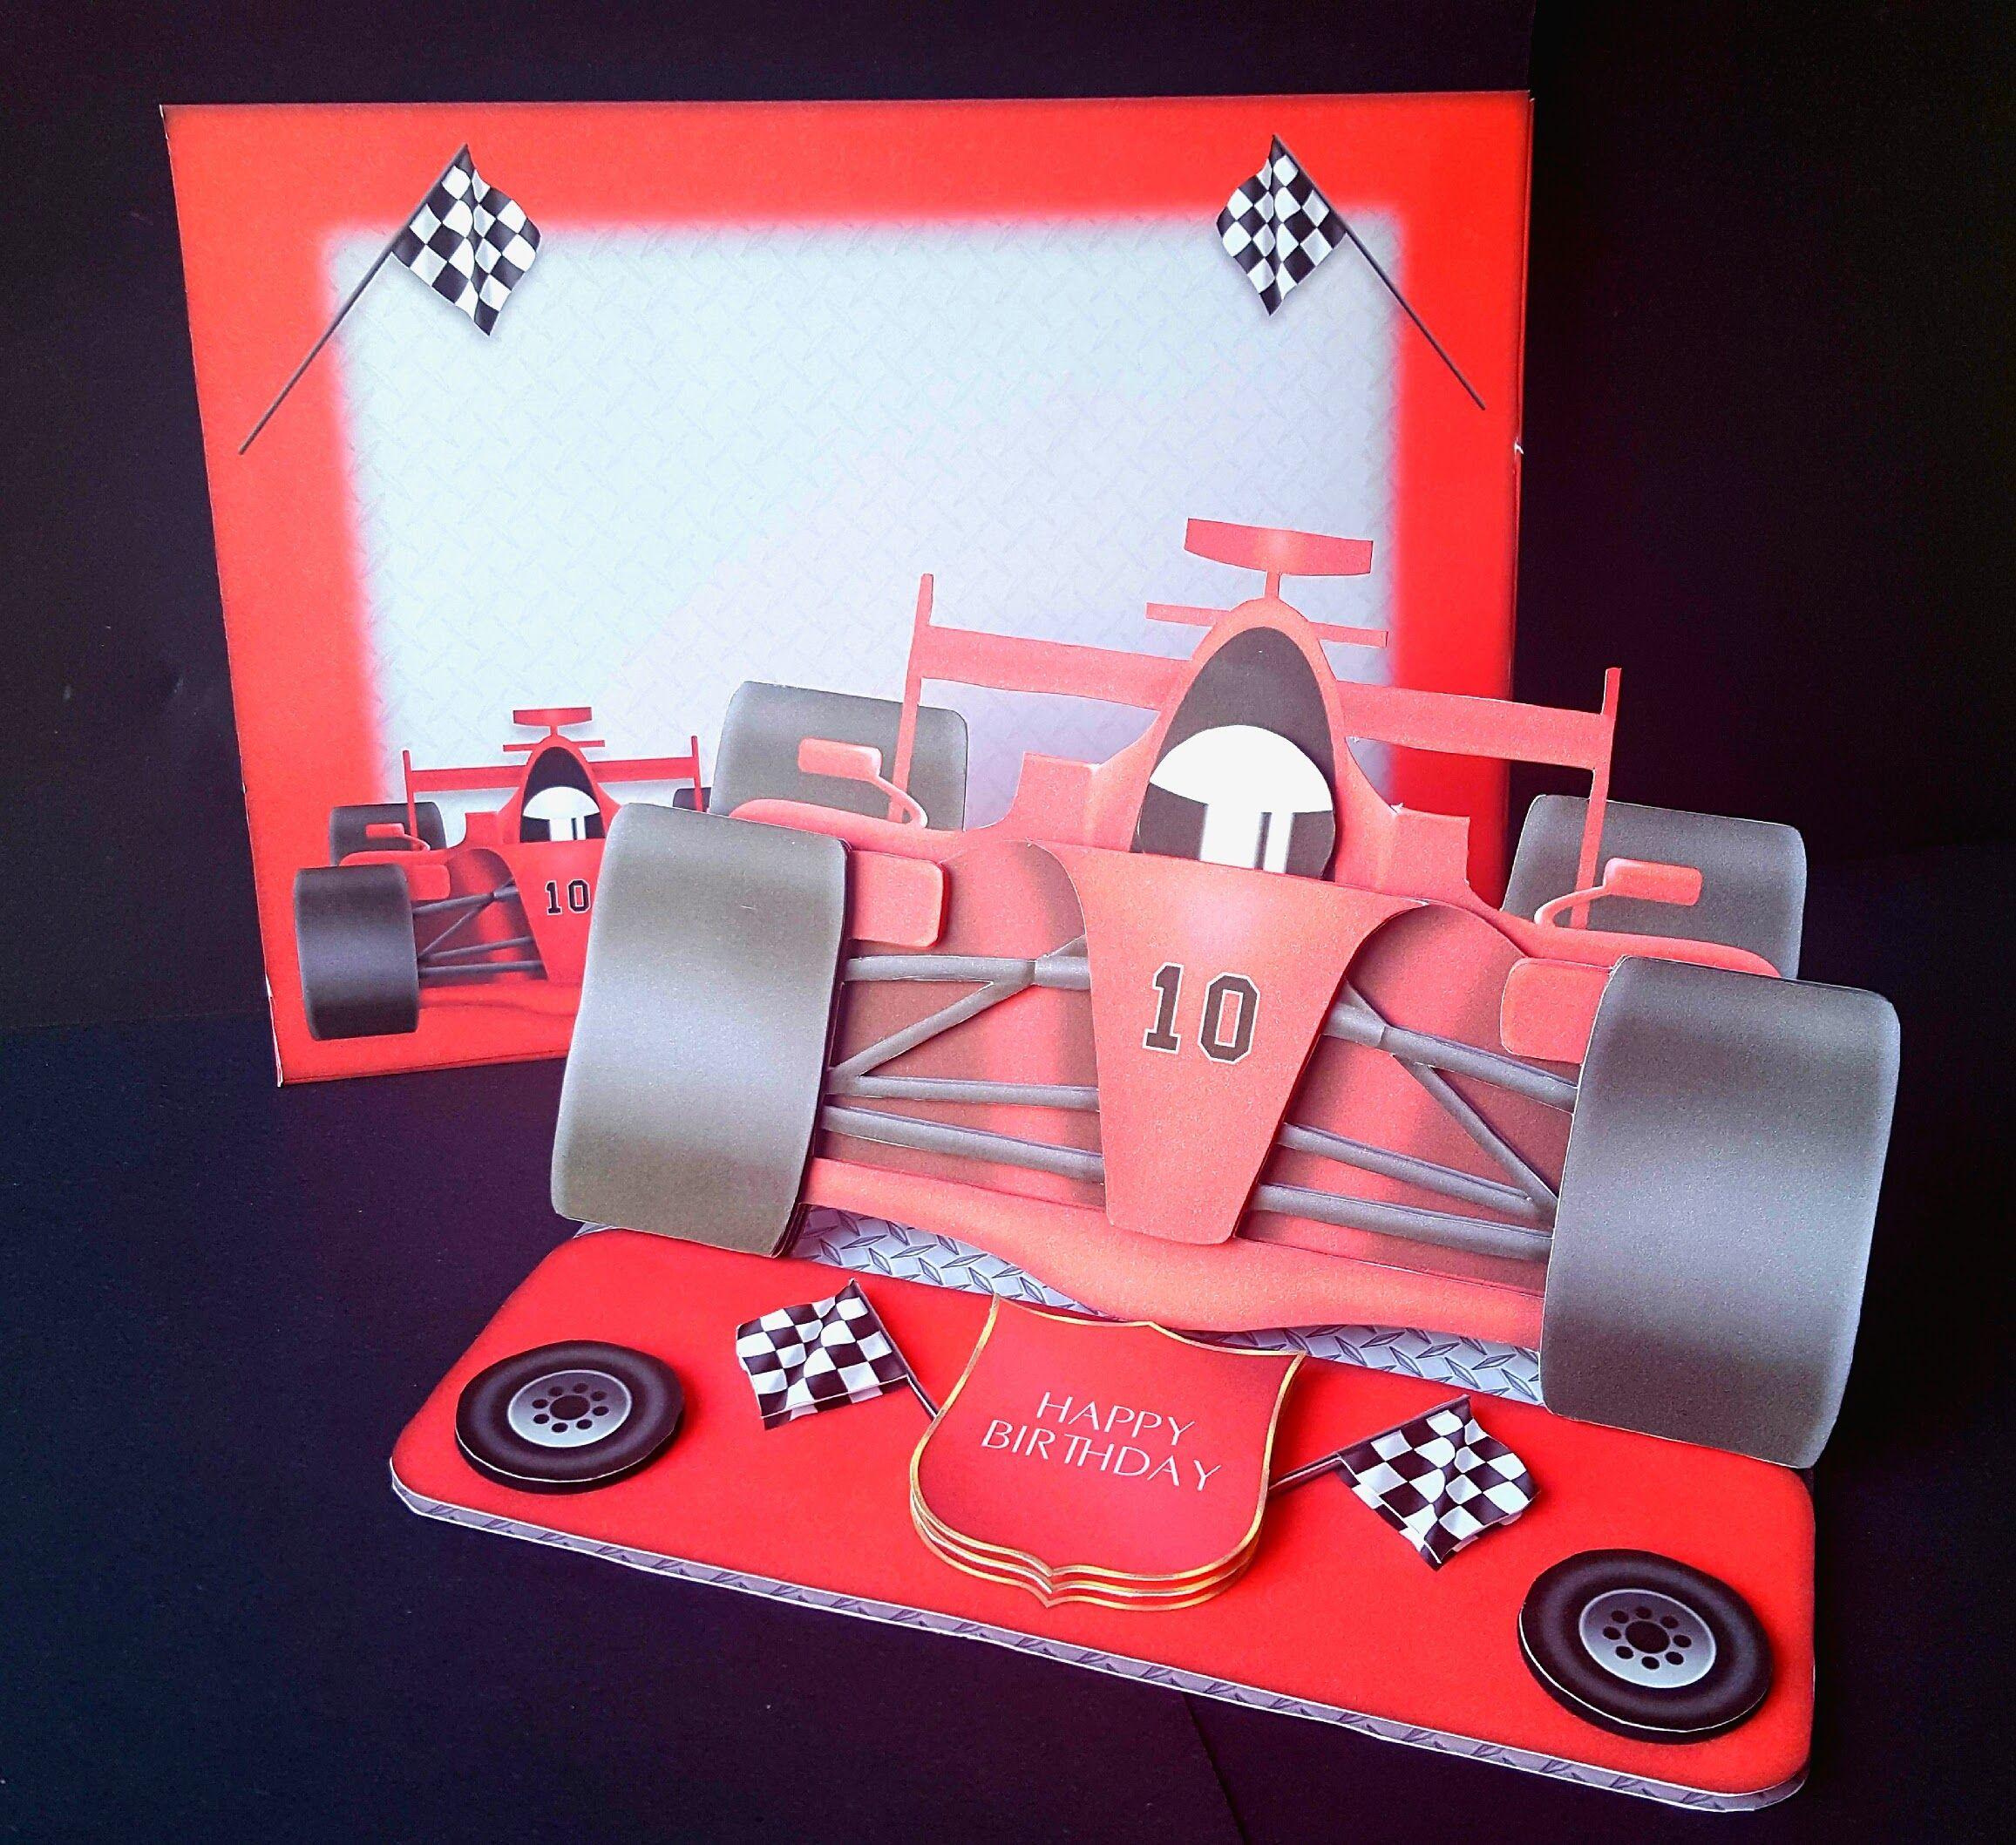 F1 formula one racing car shaped birthday car with